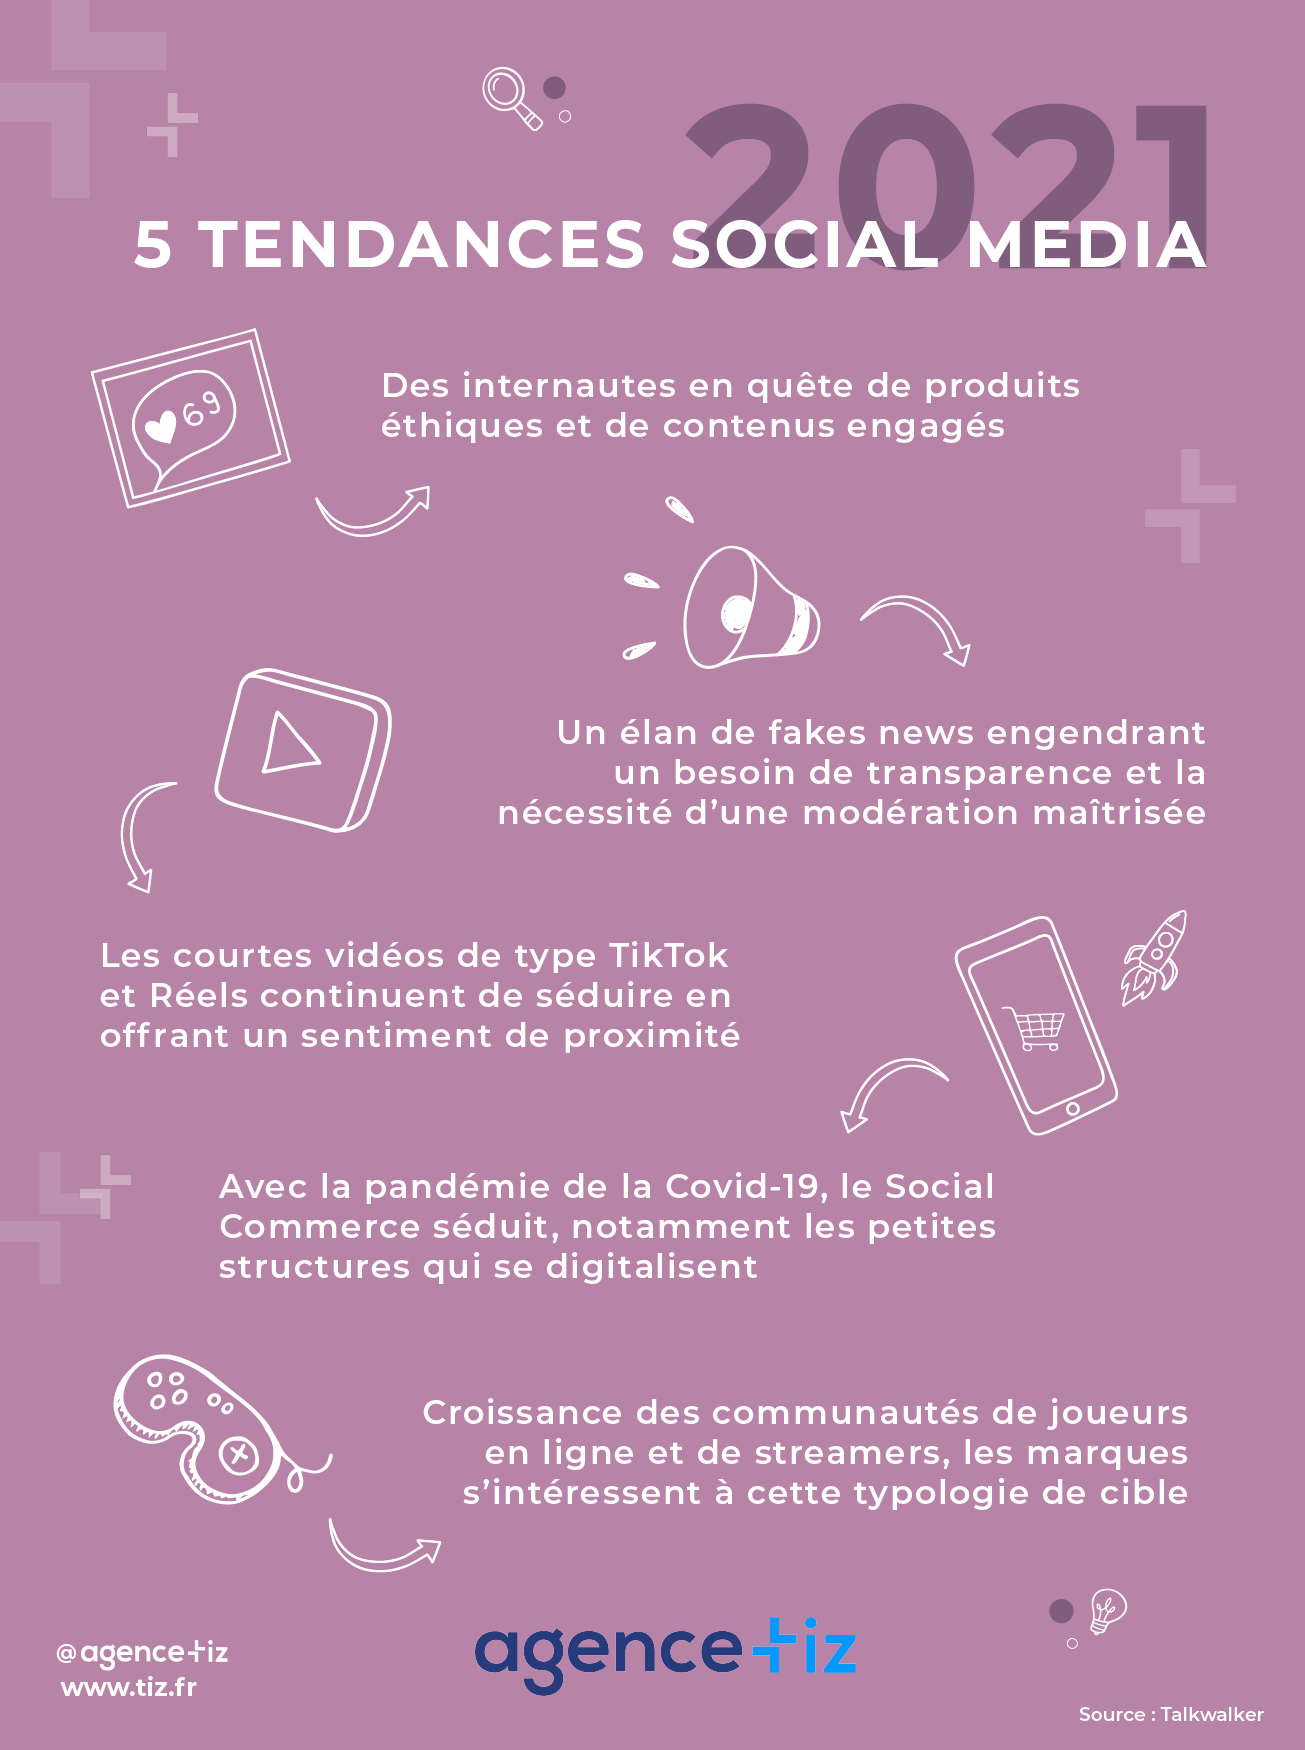 5 tendances social media en 2021